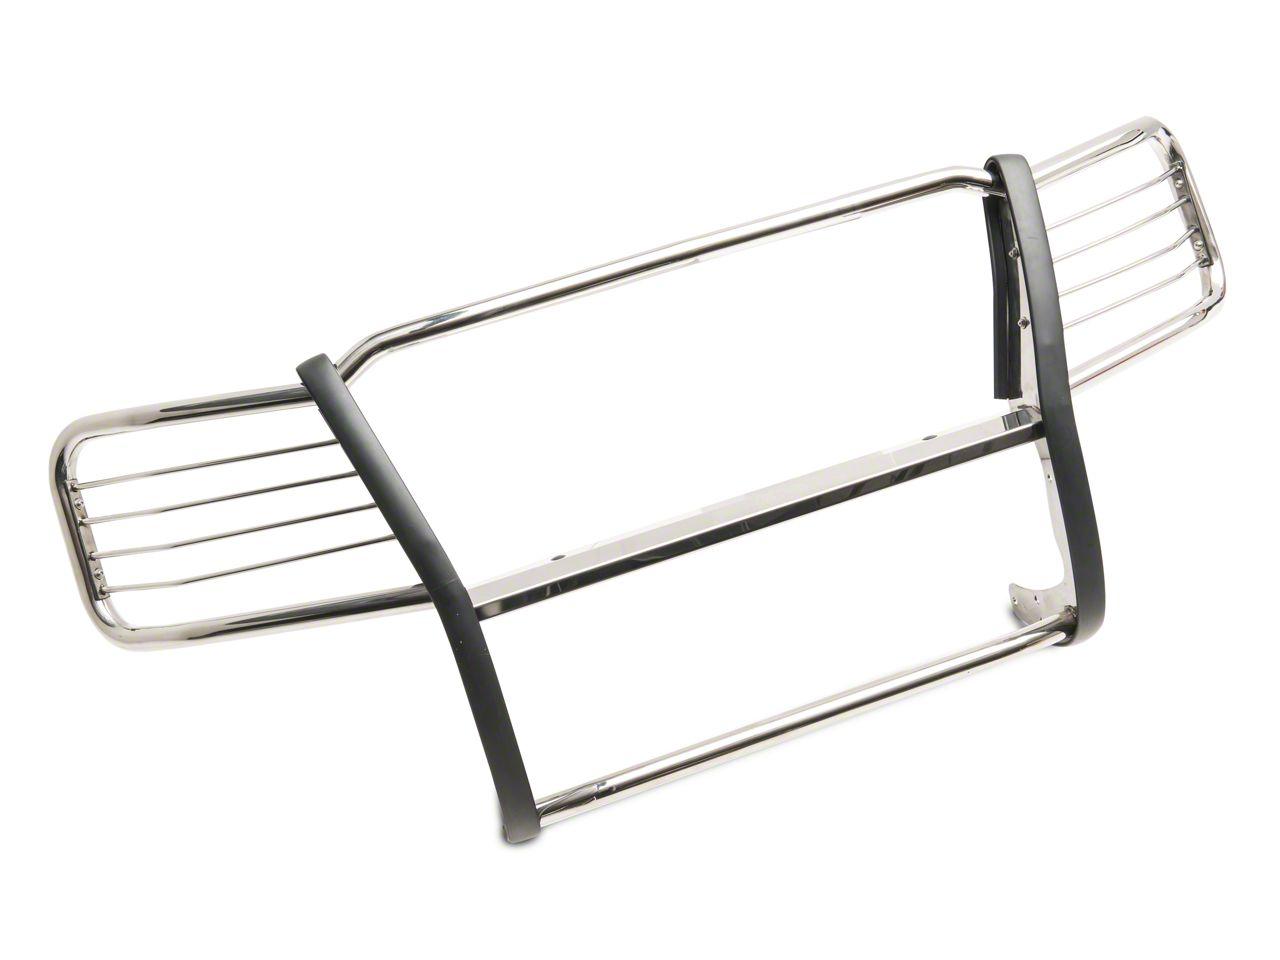 Duratrek Grille Guard - Stainless Steel (03-06 Silverado 1500)